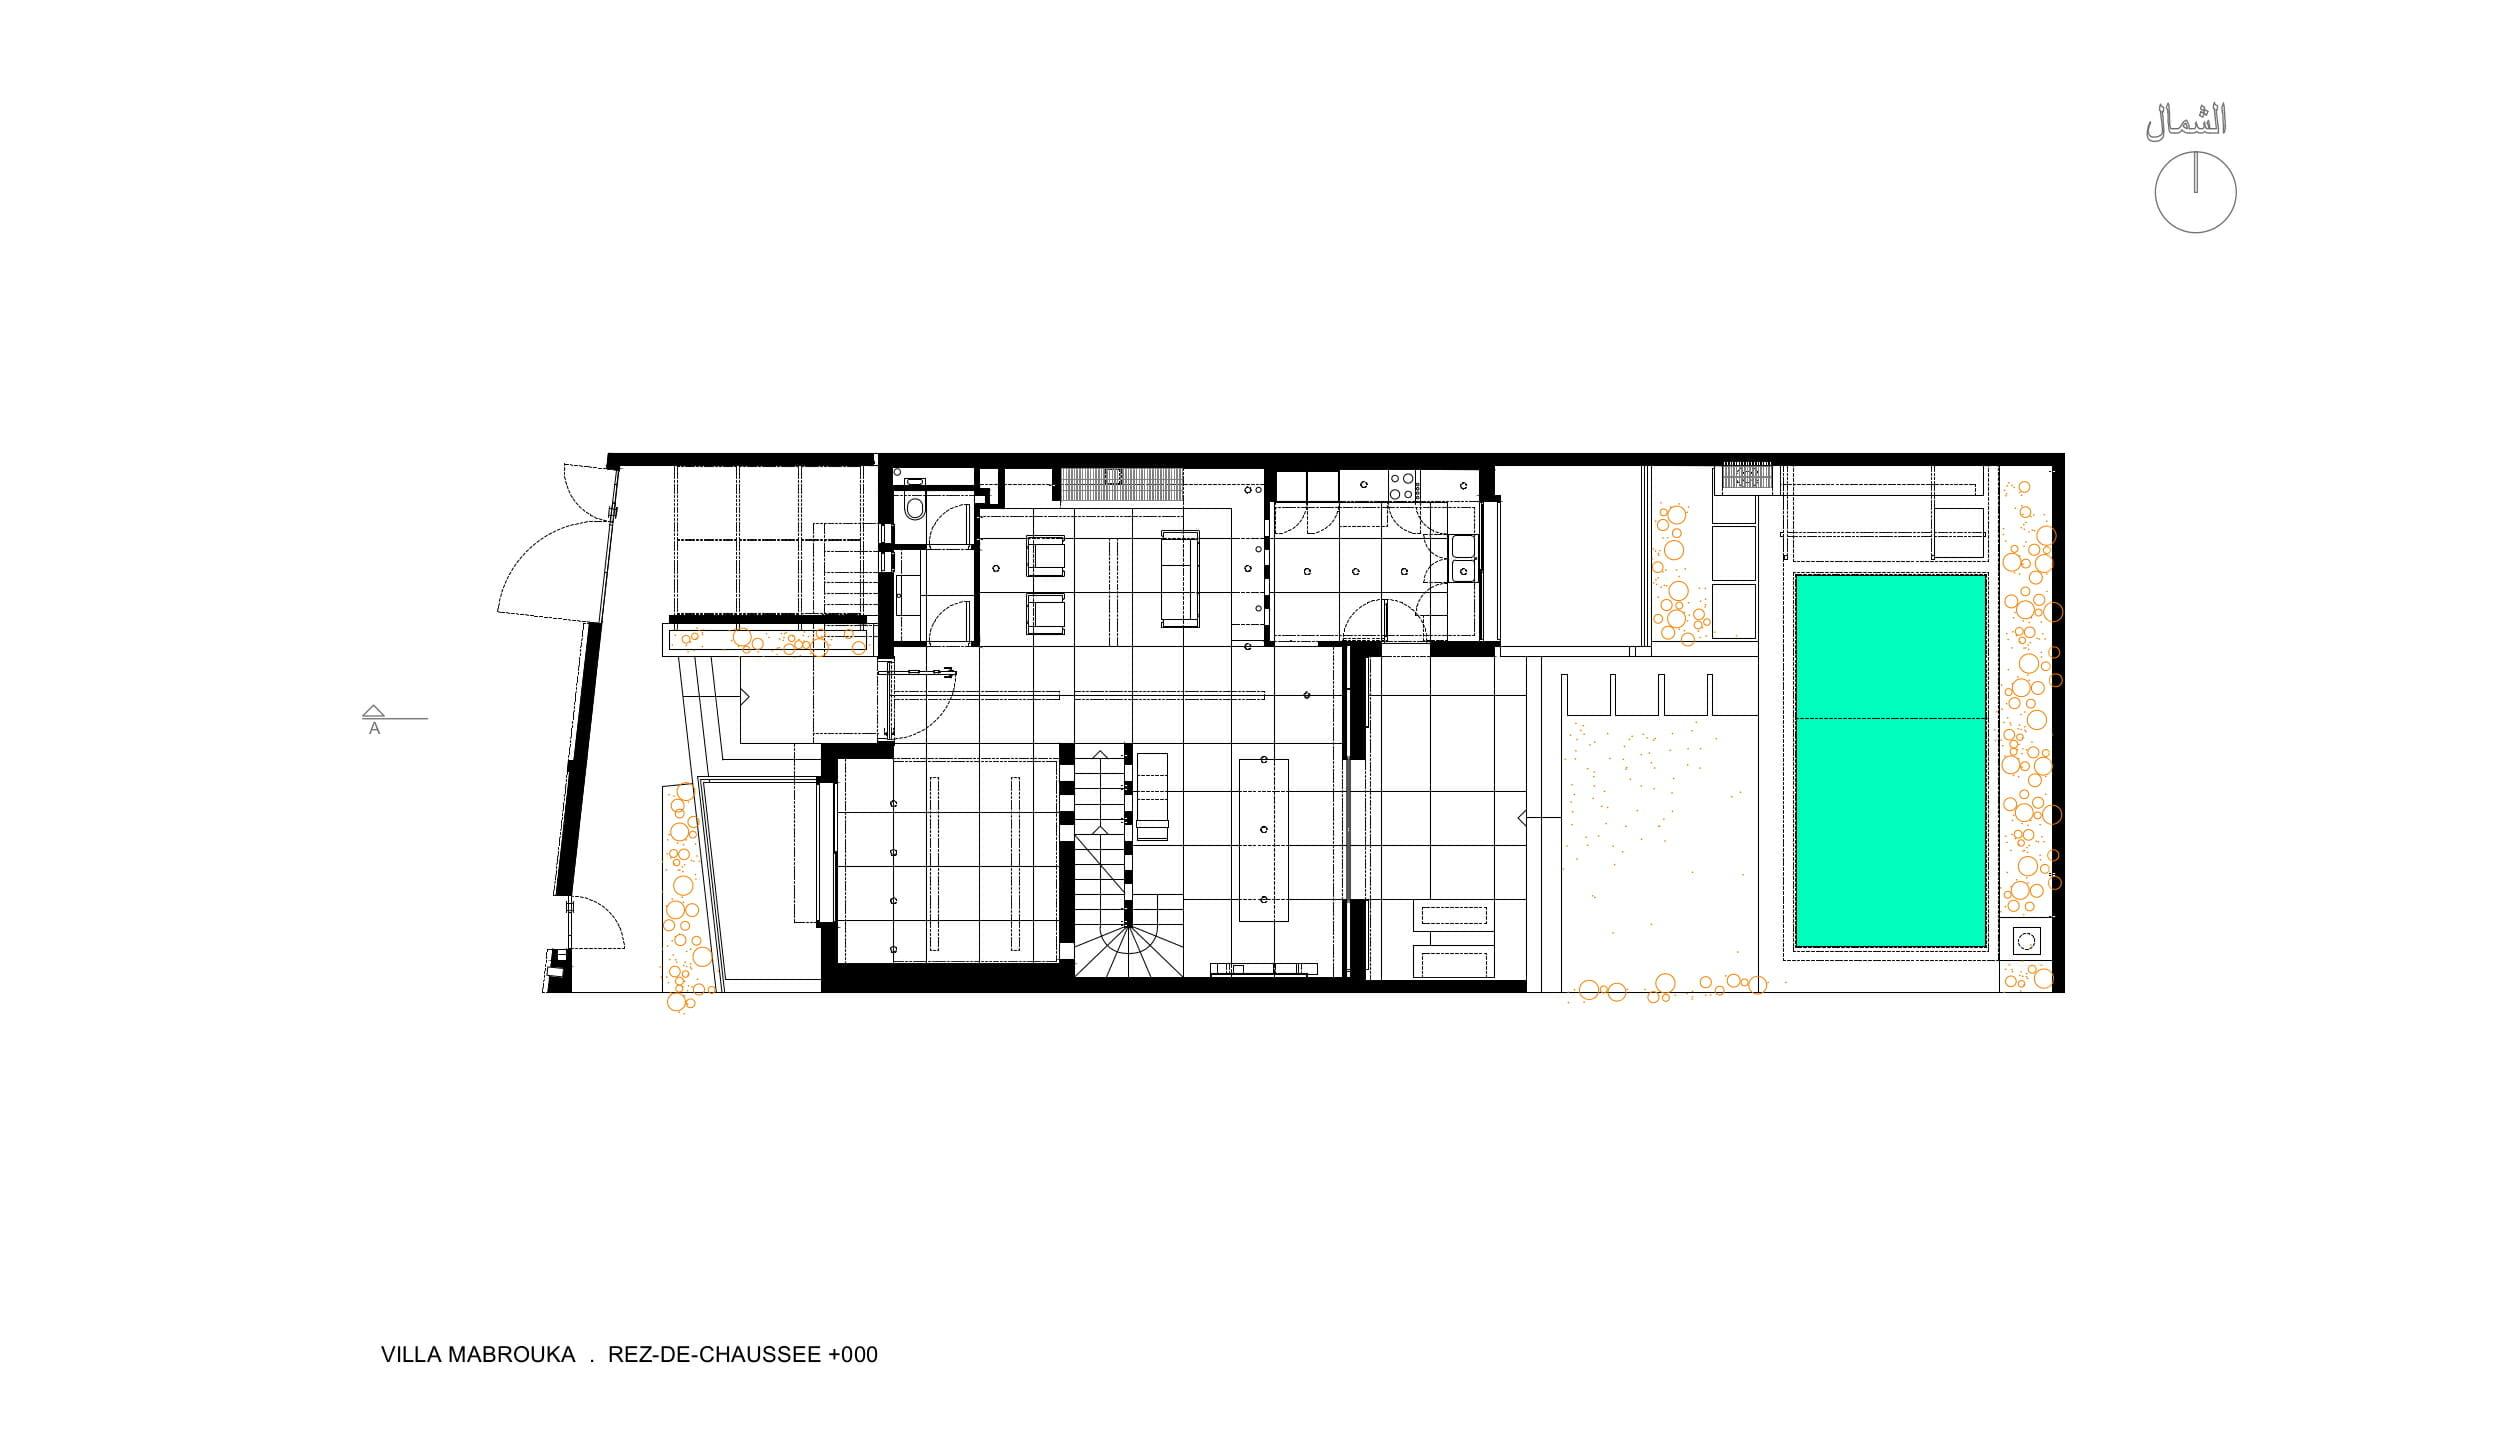 MABROUKA.plan 01-rdc